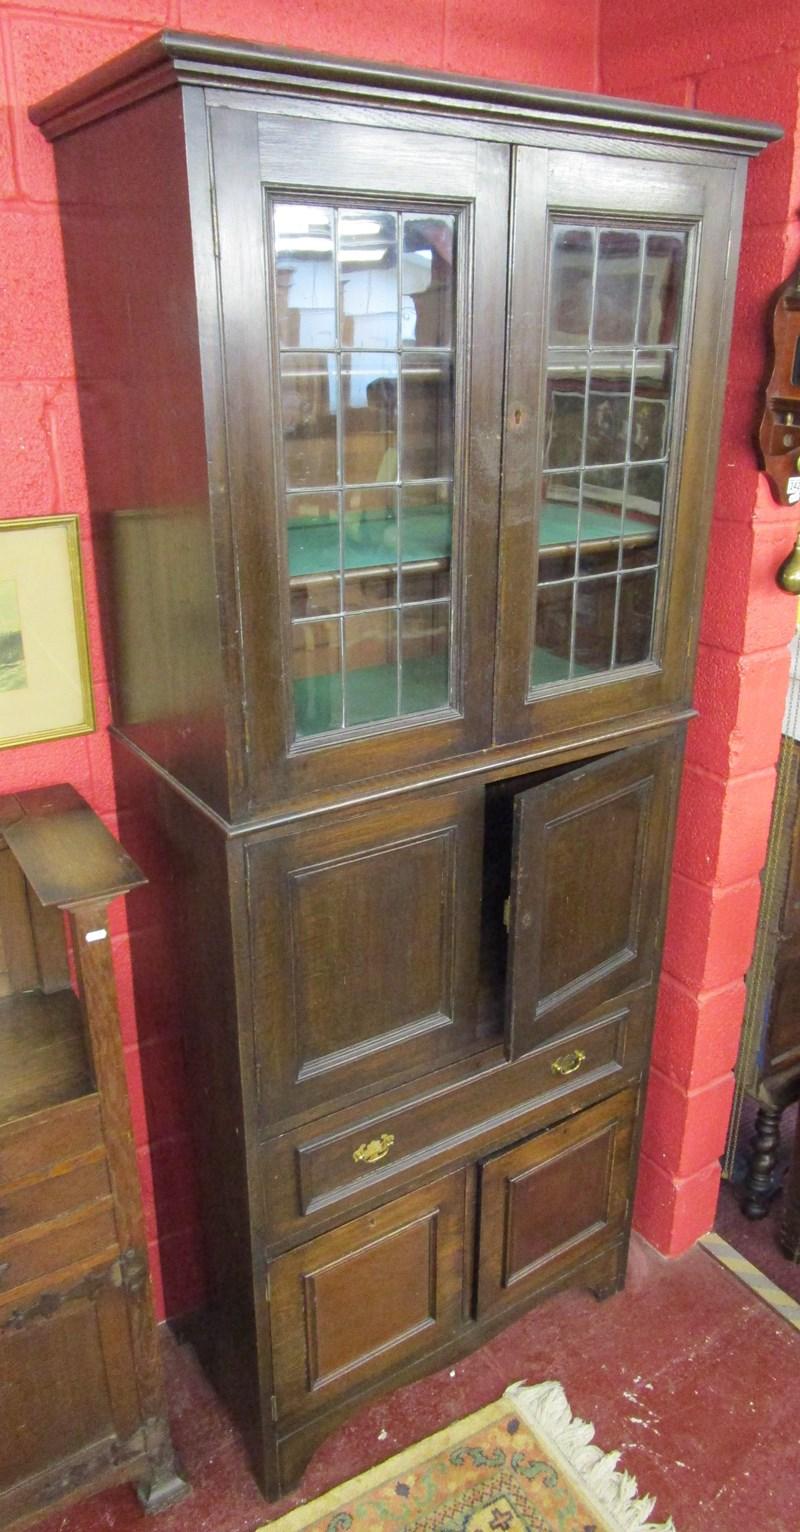 Lot 241 - Tall oak cabinet with glazed doors